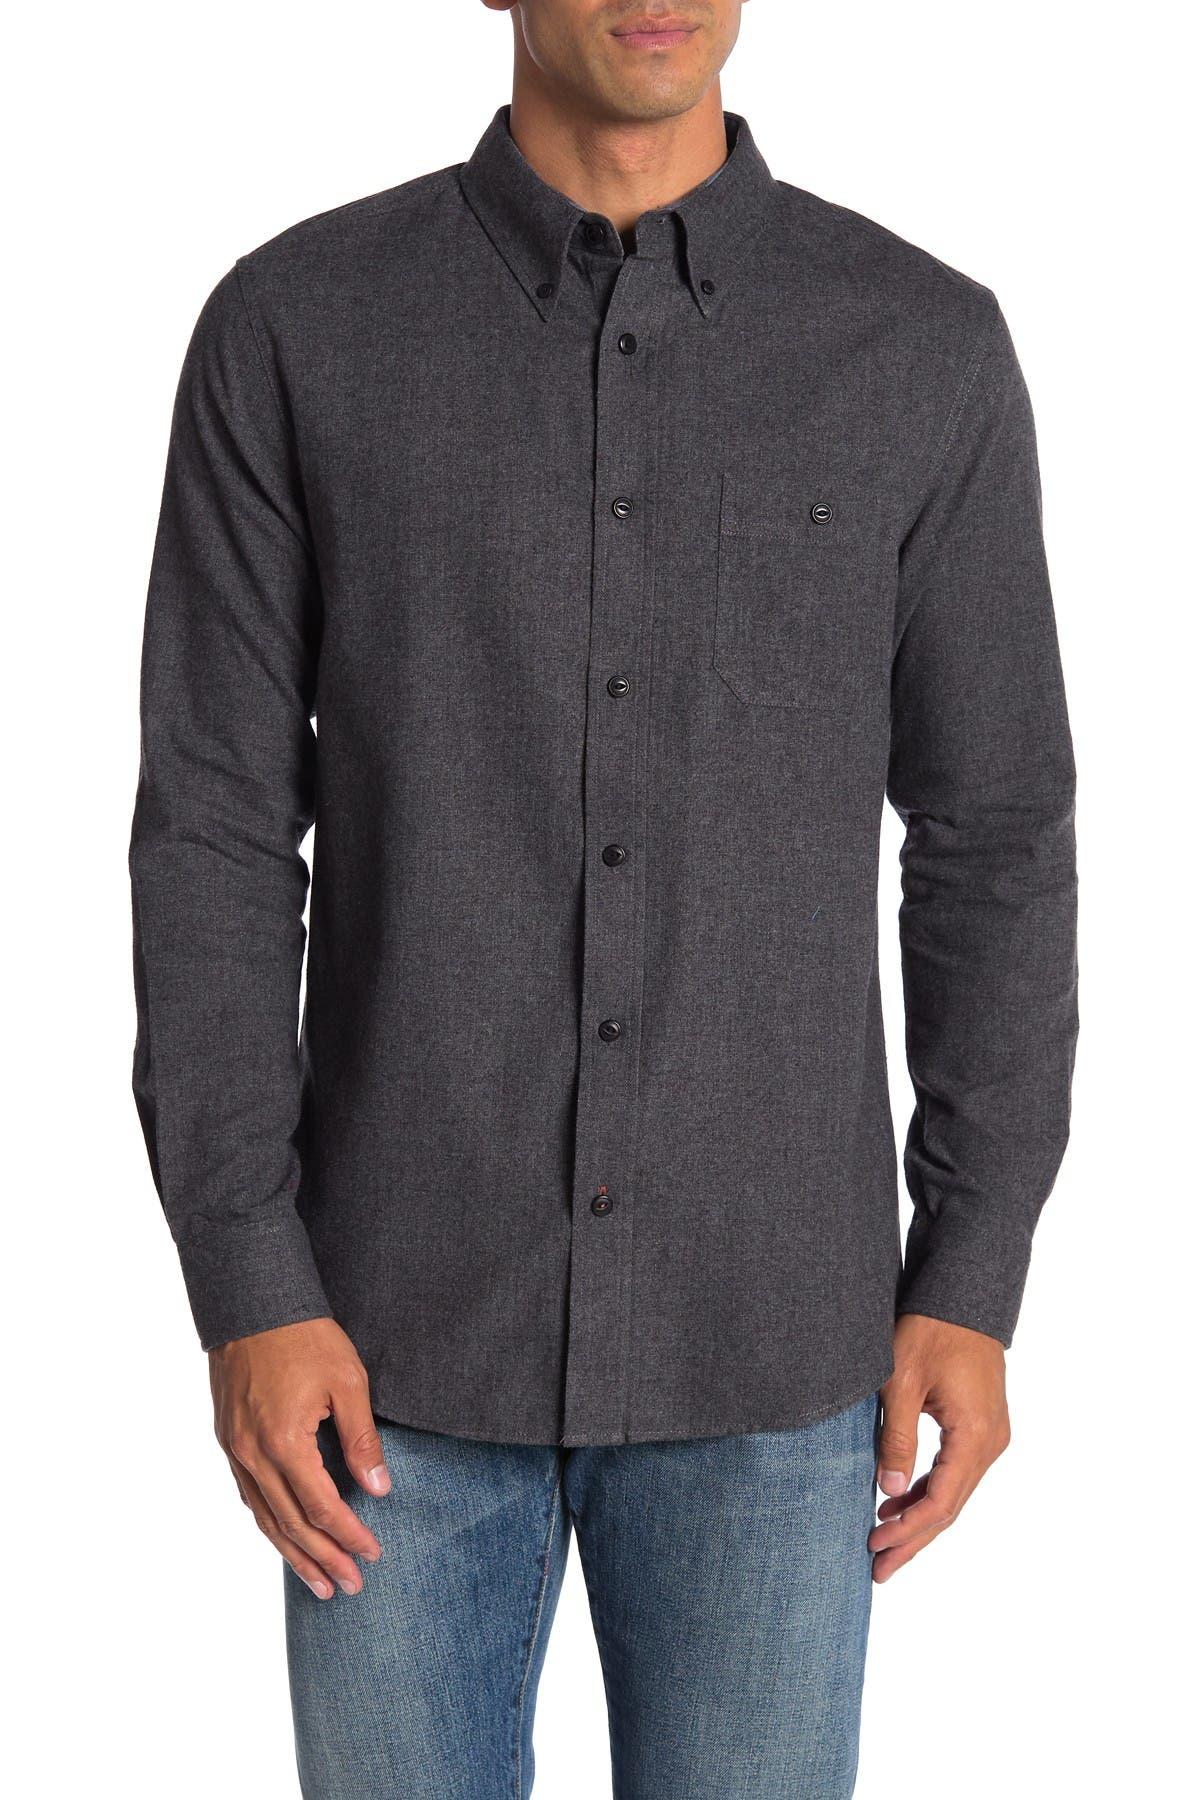 Image of weatherproof Solid Flannel Long Sleeve Shirt